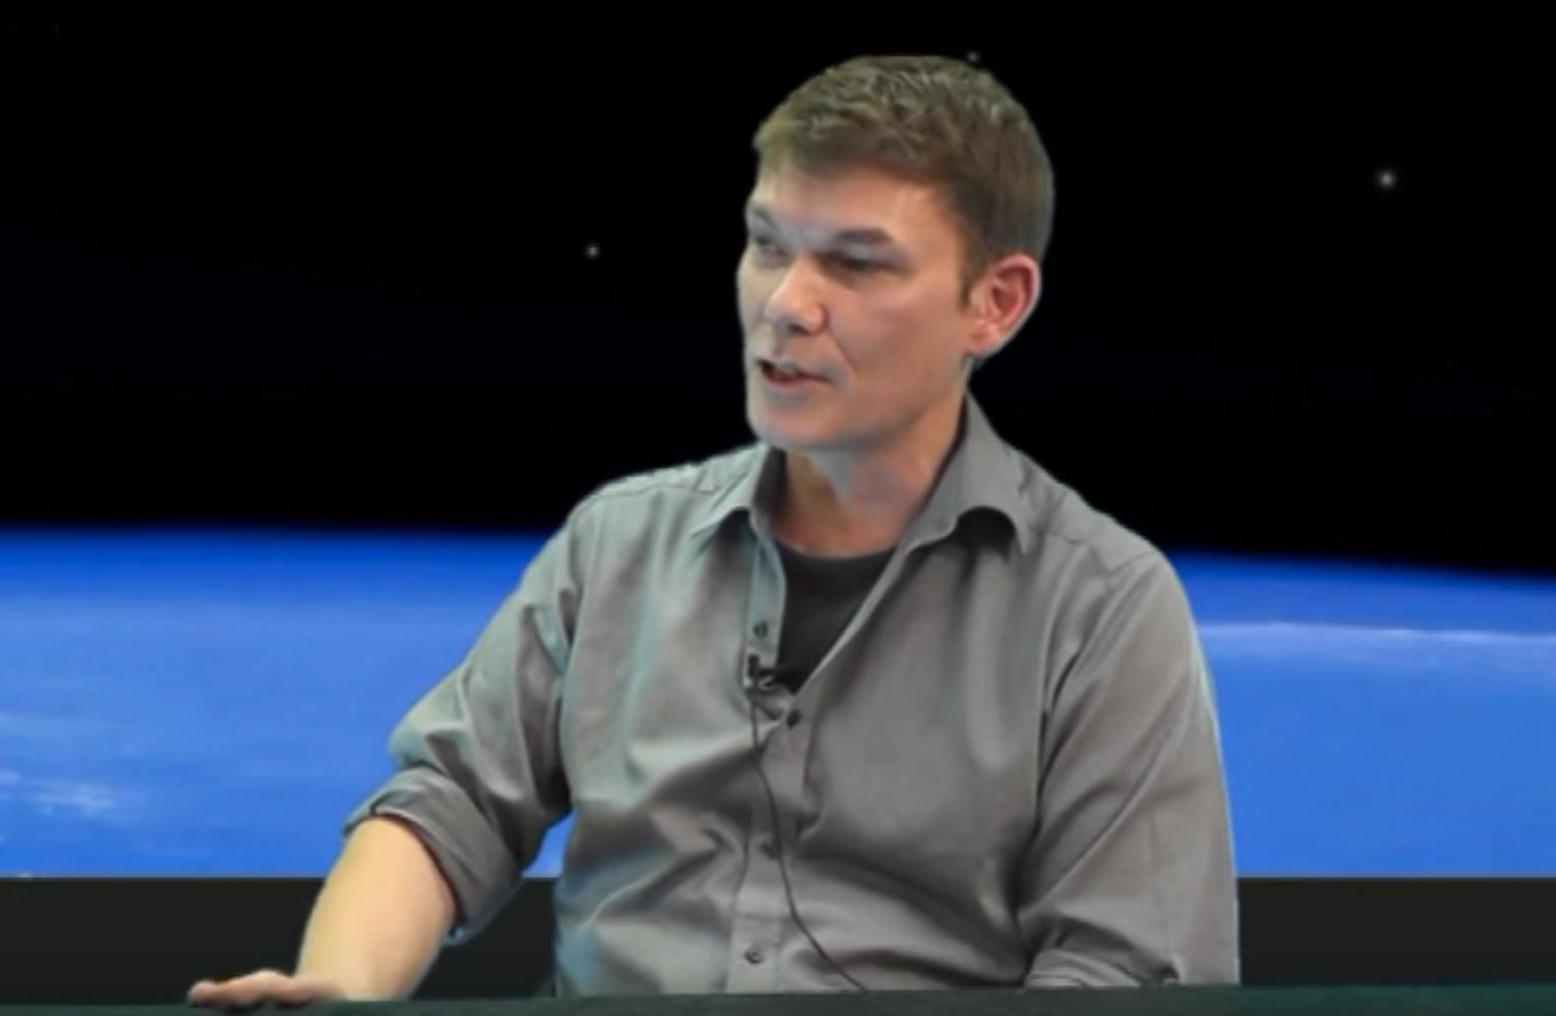 Gary McKinnon on RichPlanet TV Credit: Richard Hall